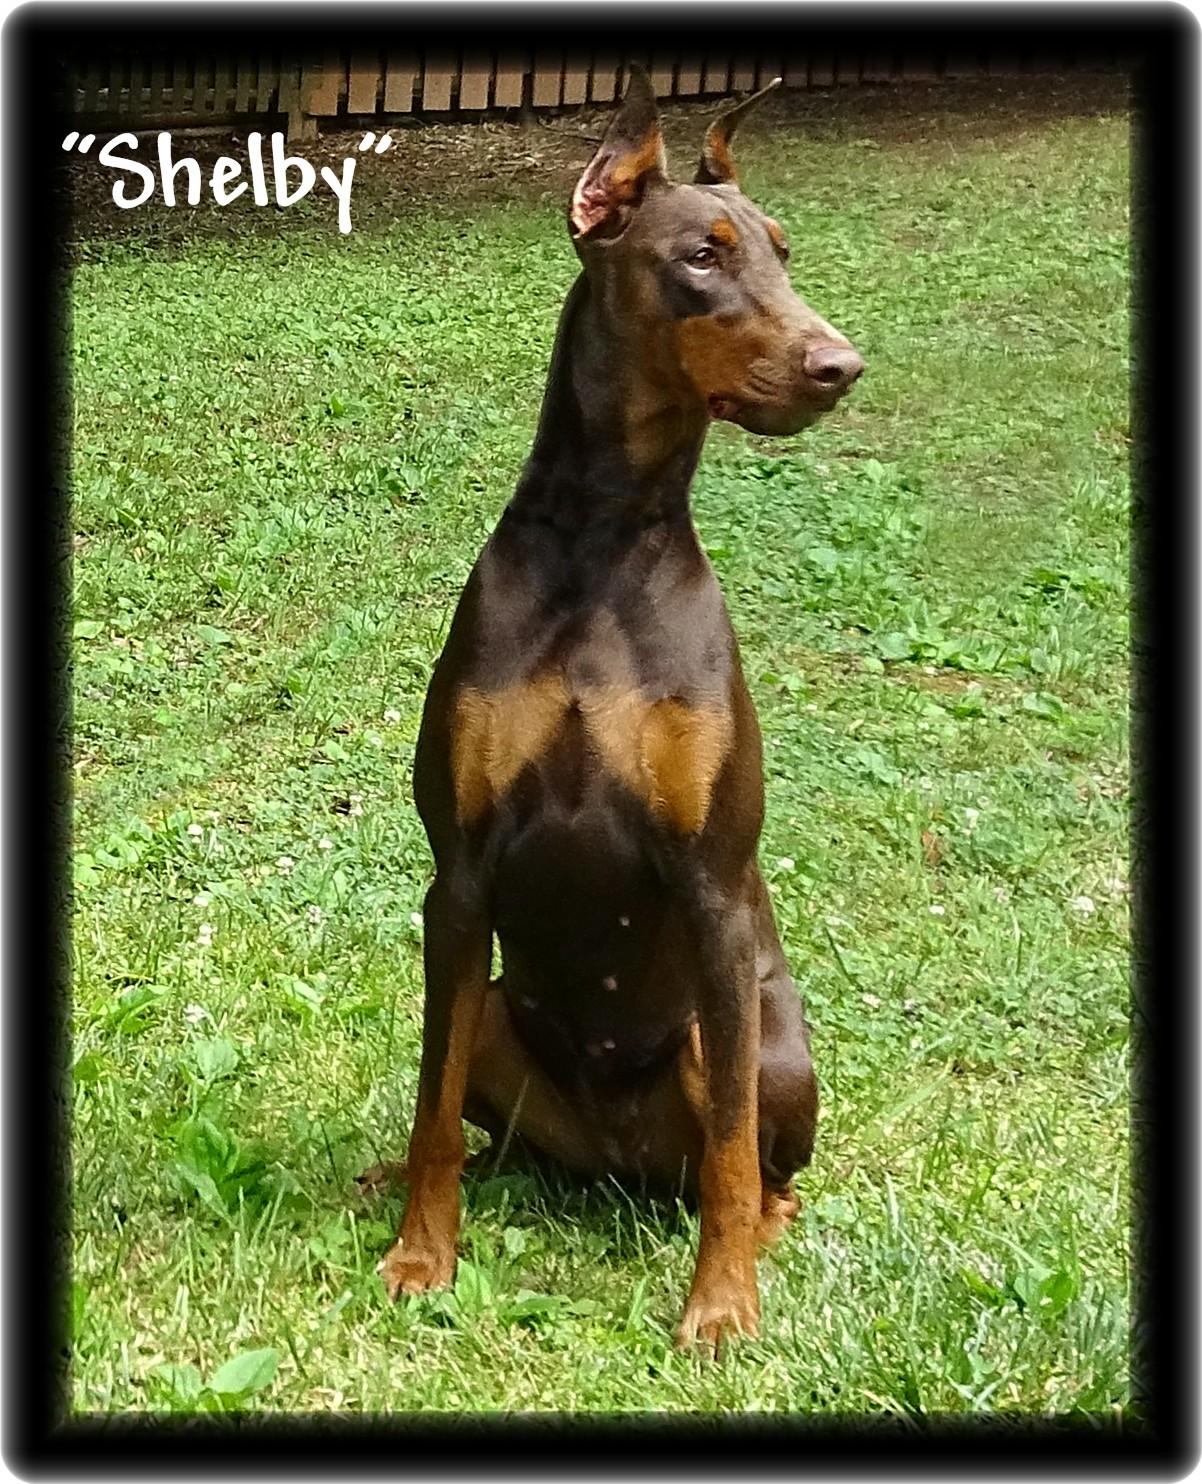 shelby-067.jpg